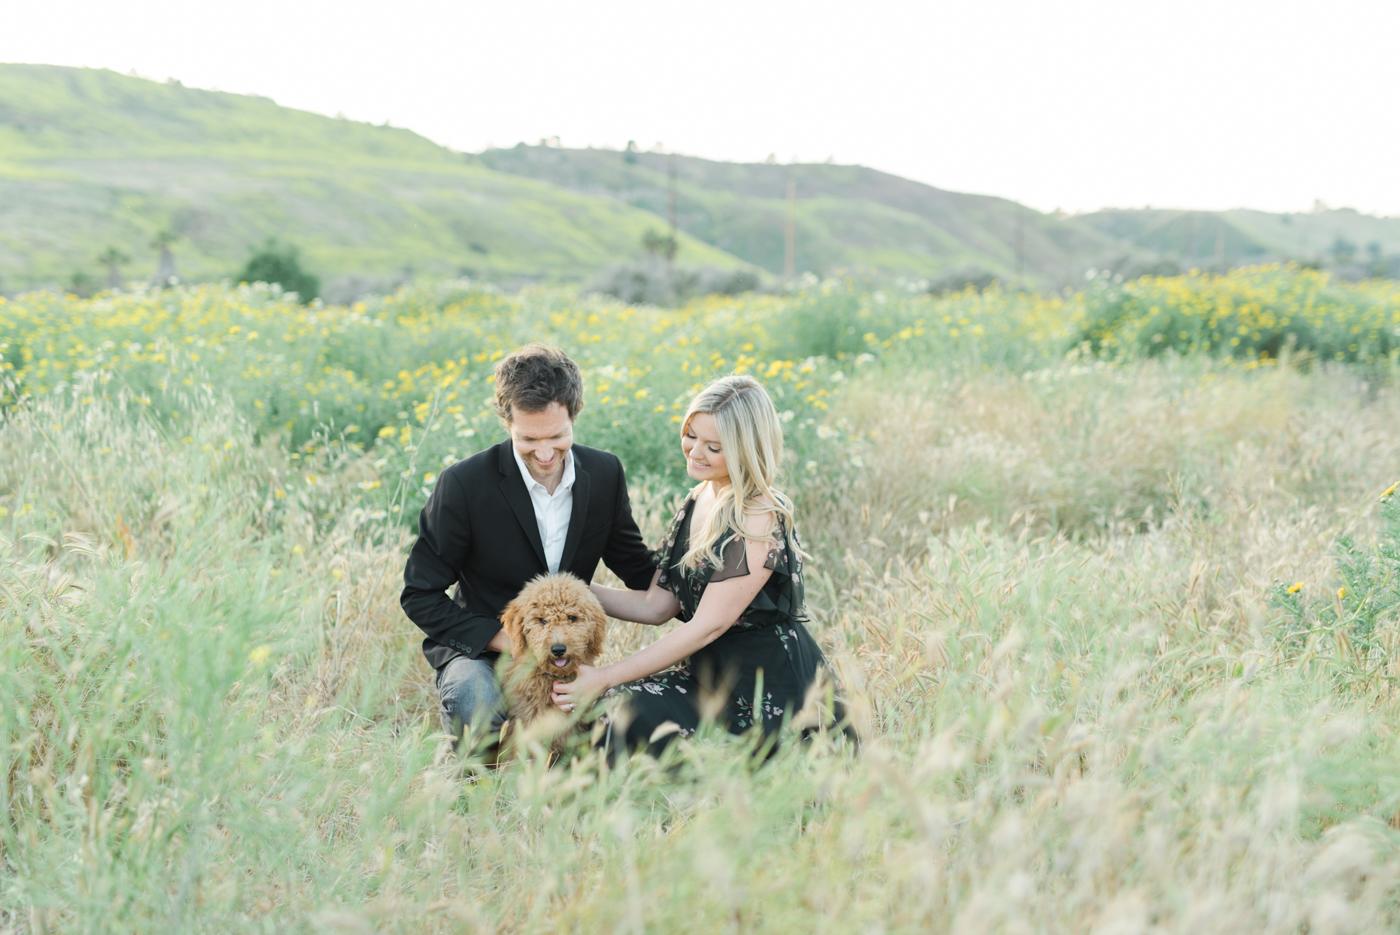 San_Juan_Capistrano_Goldendoodle_family_portrait_session_los_angeles_wedding_photographer-23.jpg